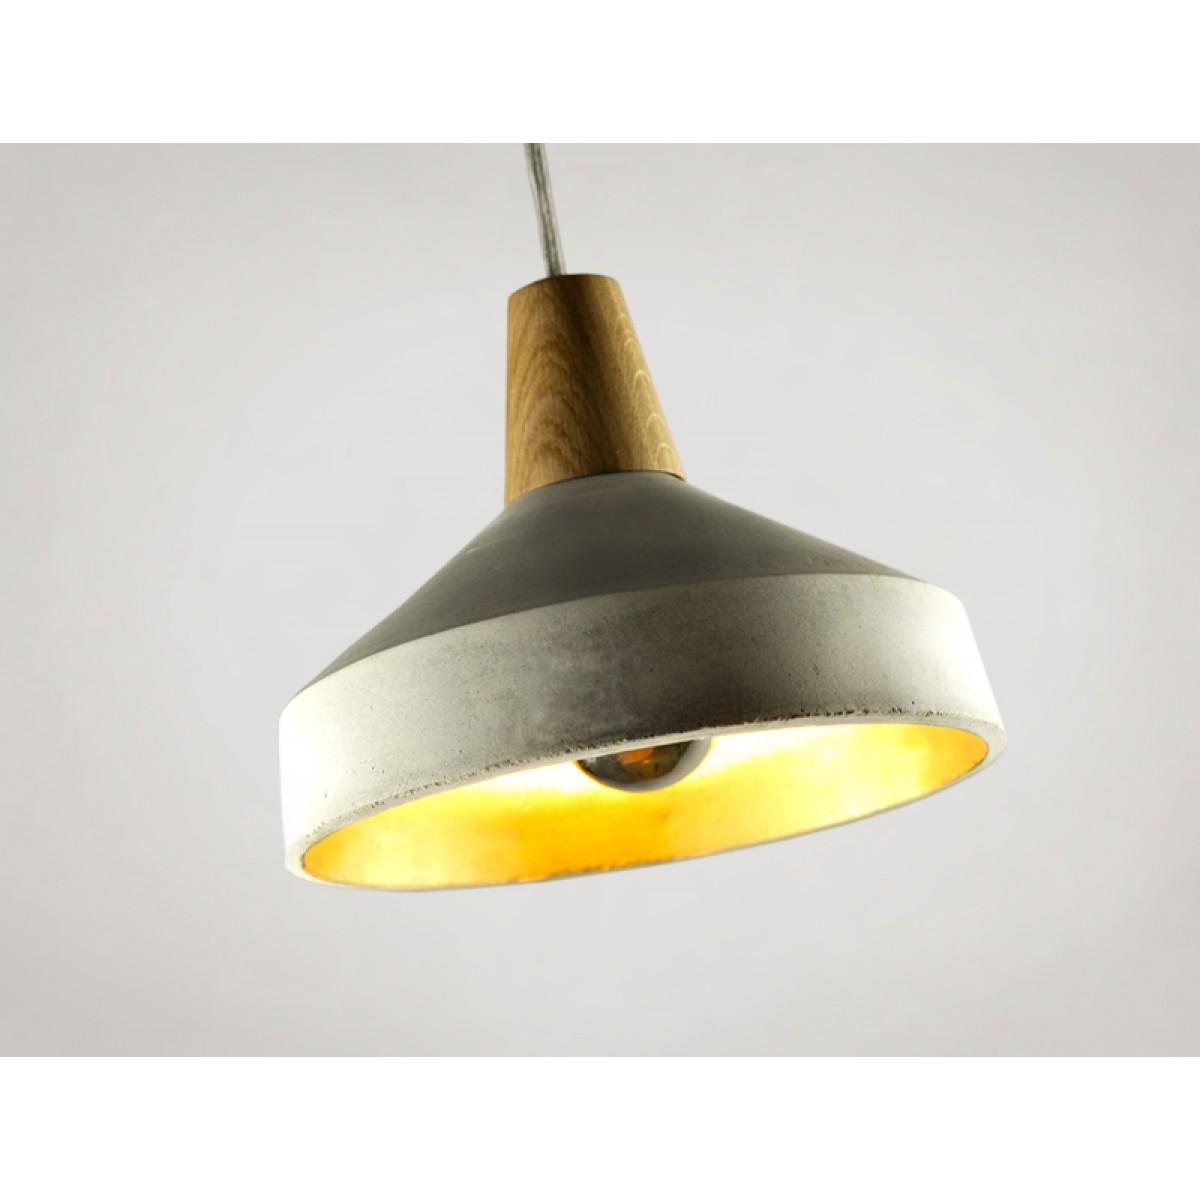 lampen aus beton lampen aus beton handmade kultur diy. Black Bedroom Furniture Sets. Home Design Ideas